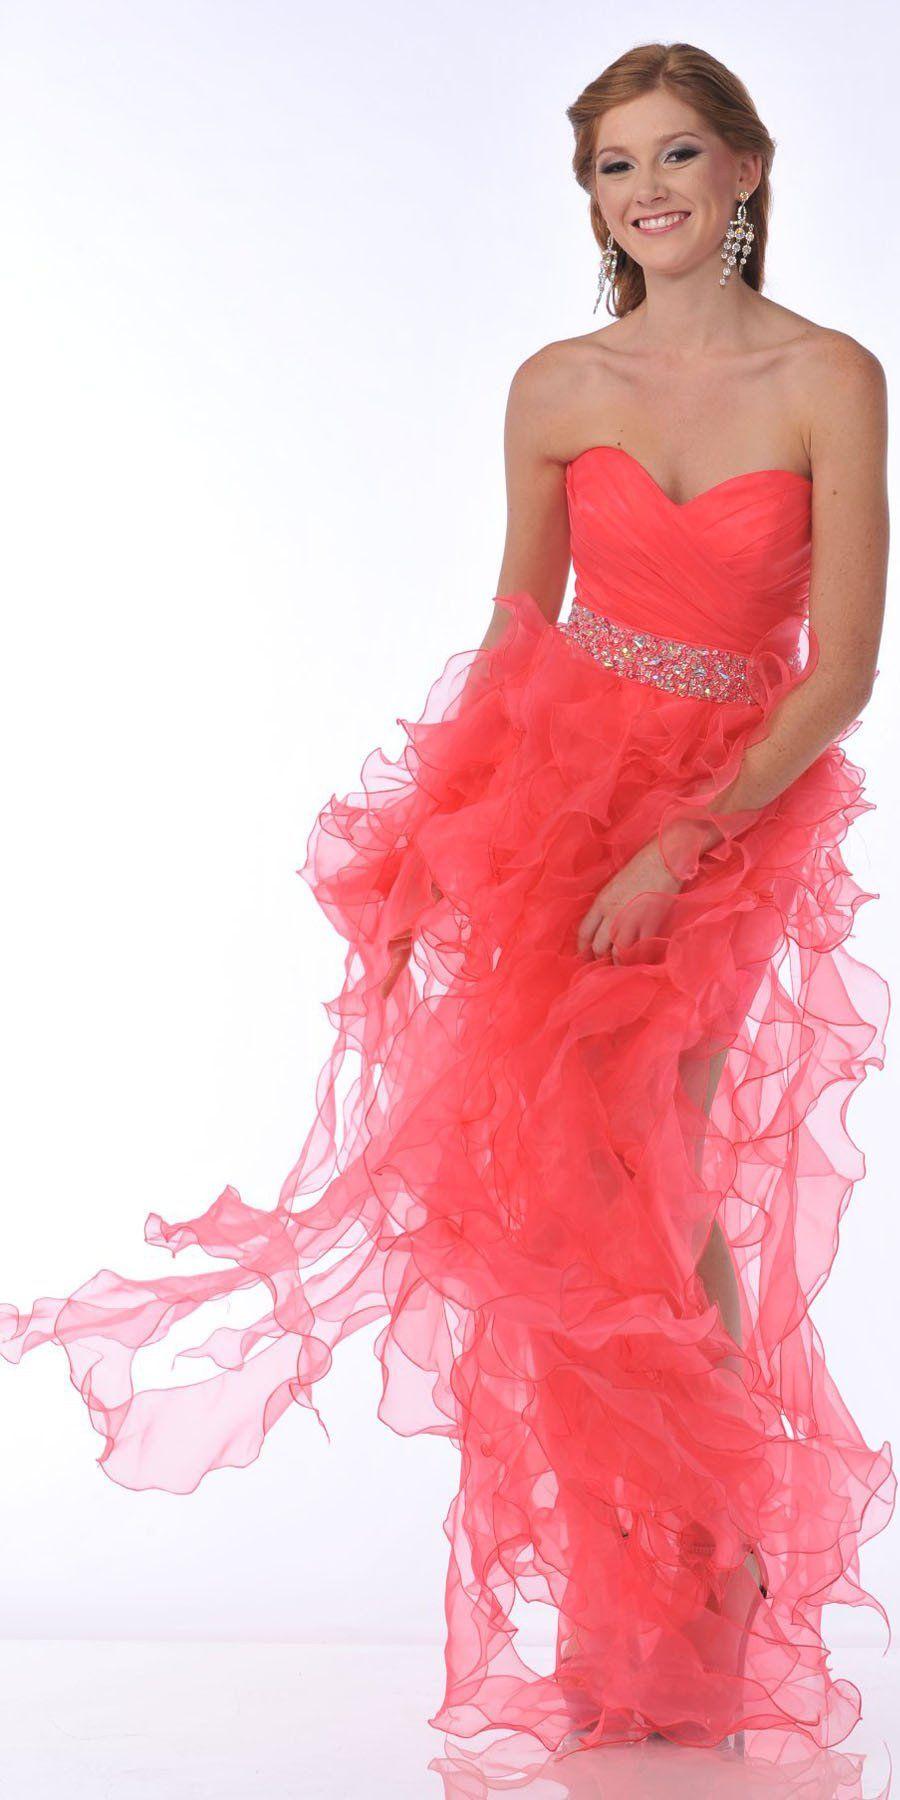 CLEARANCE - Watermelon Prom Dress Hi Low Strapless Ruffle Layers ...